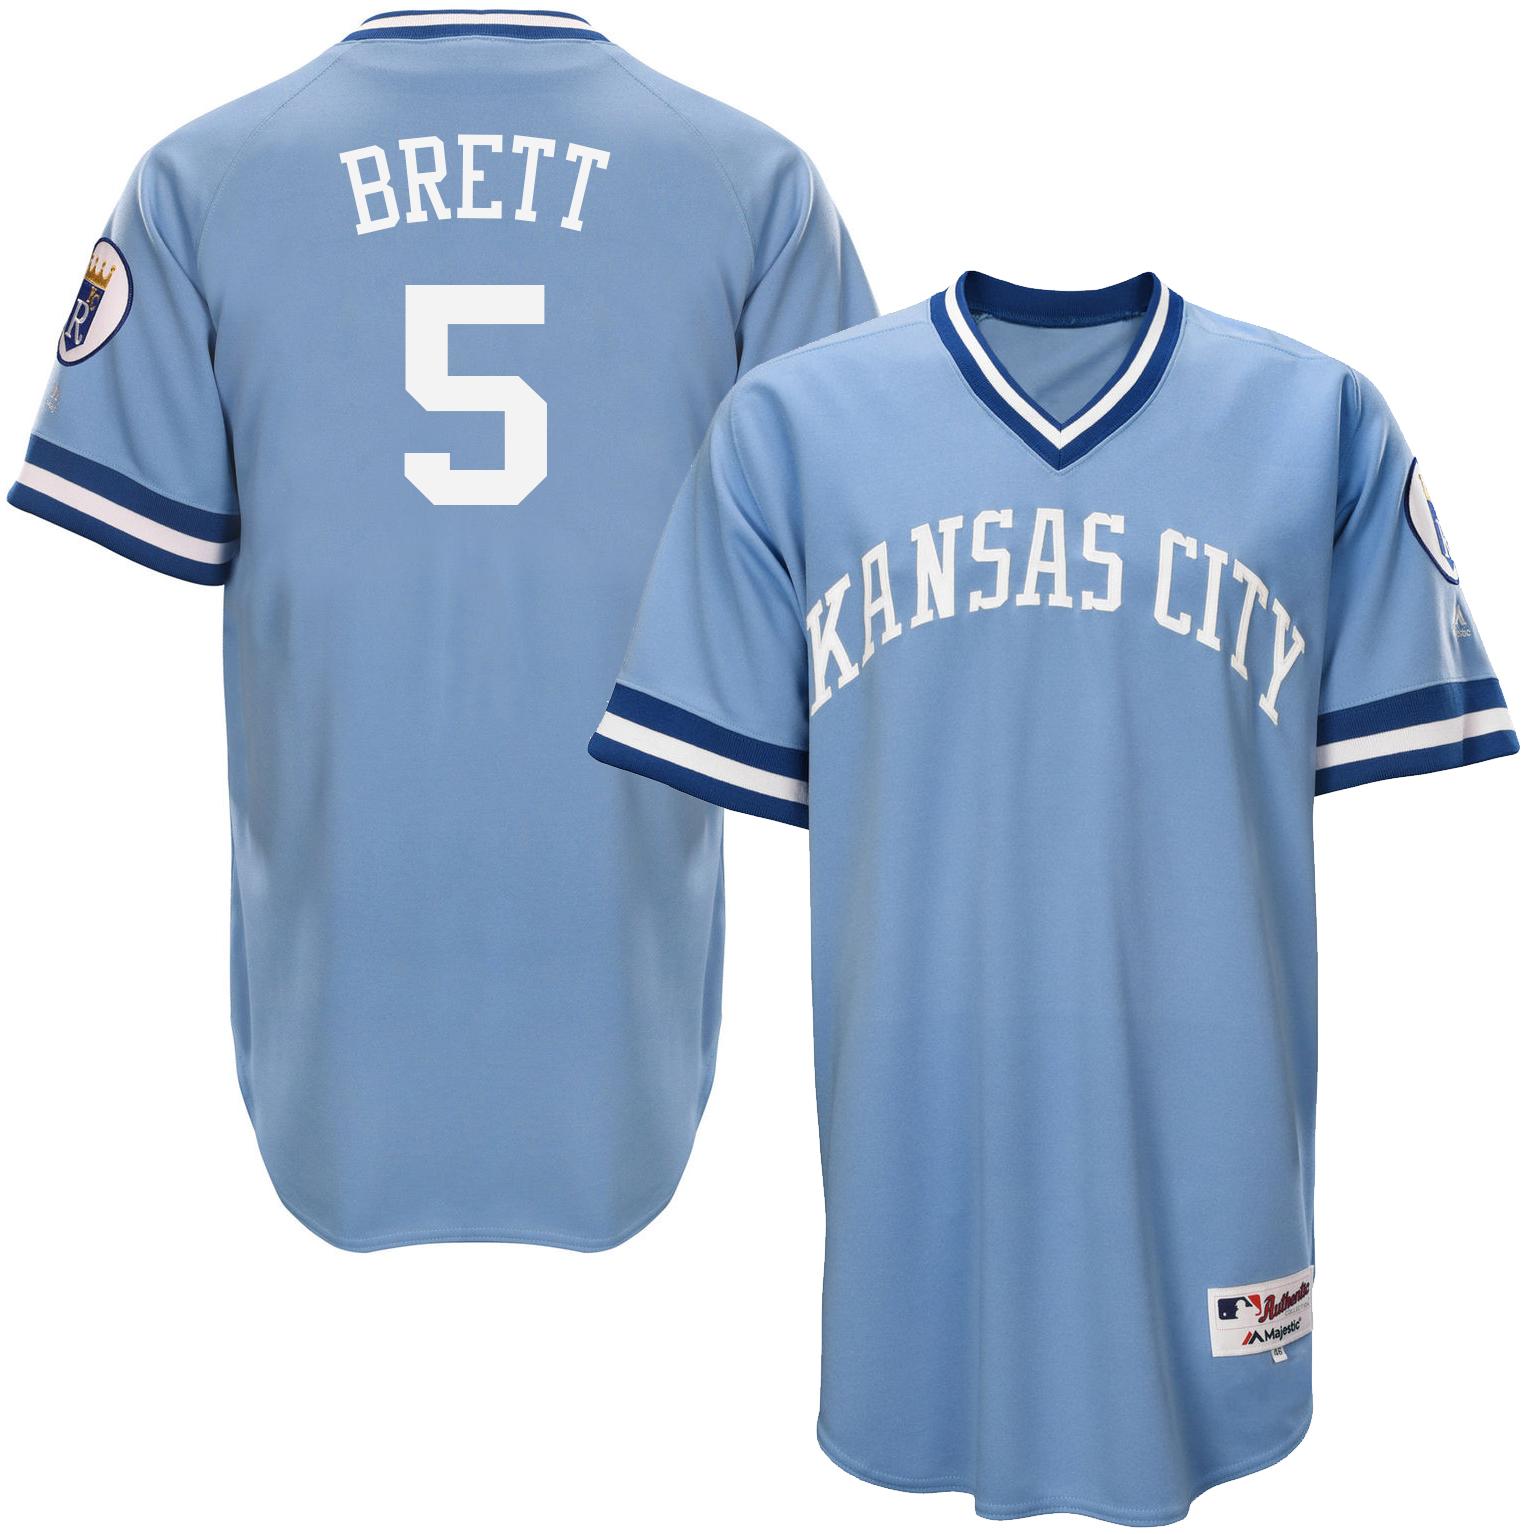 Royals 5 George Brett Light Blue Throwback Jersey